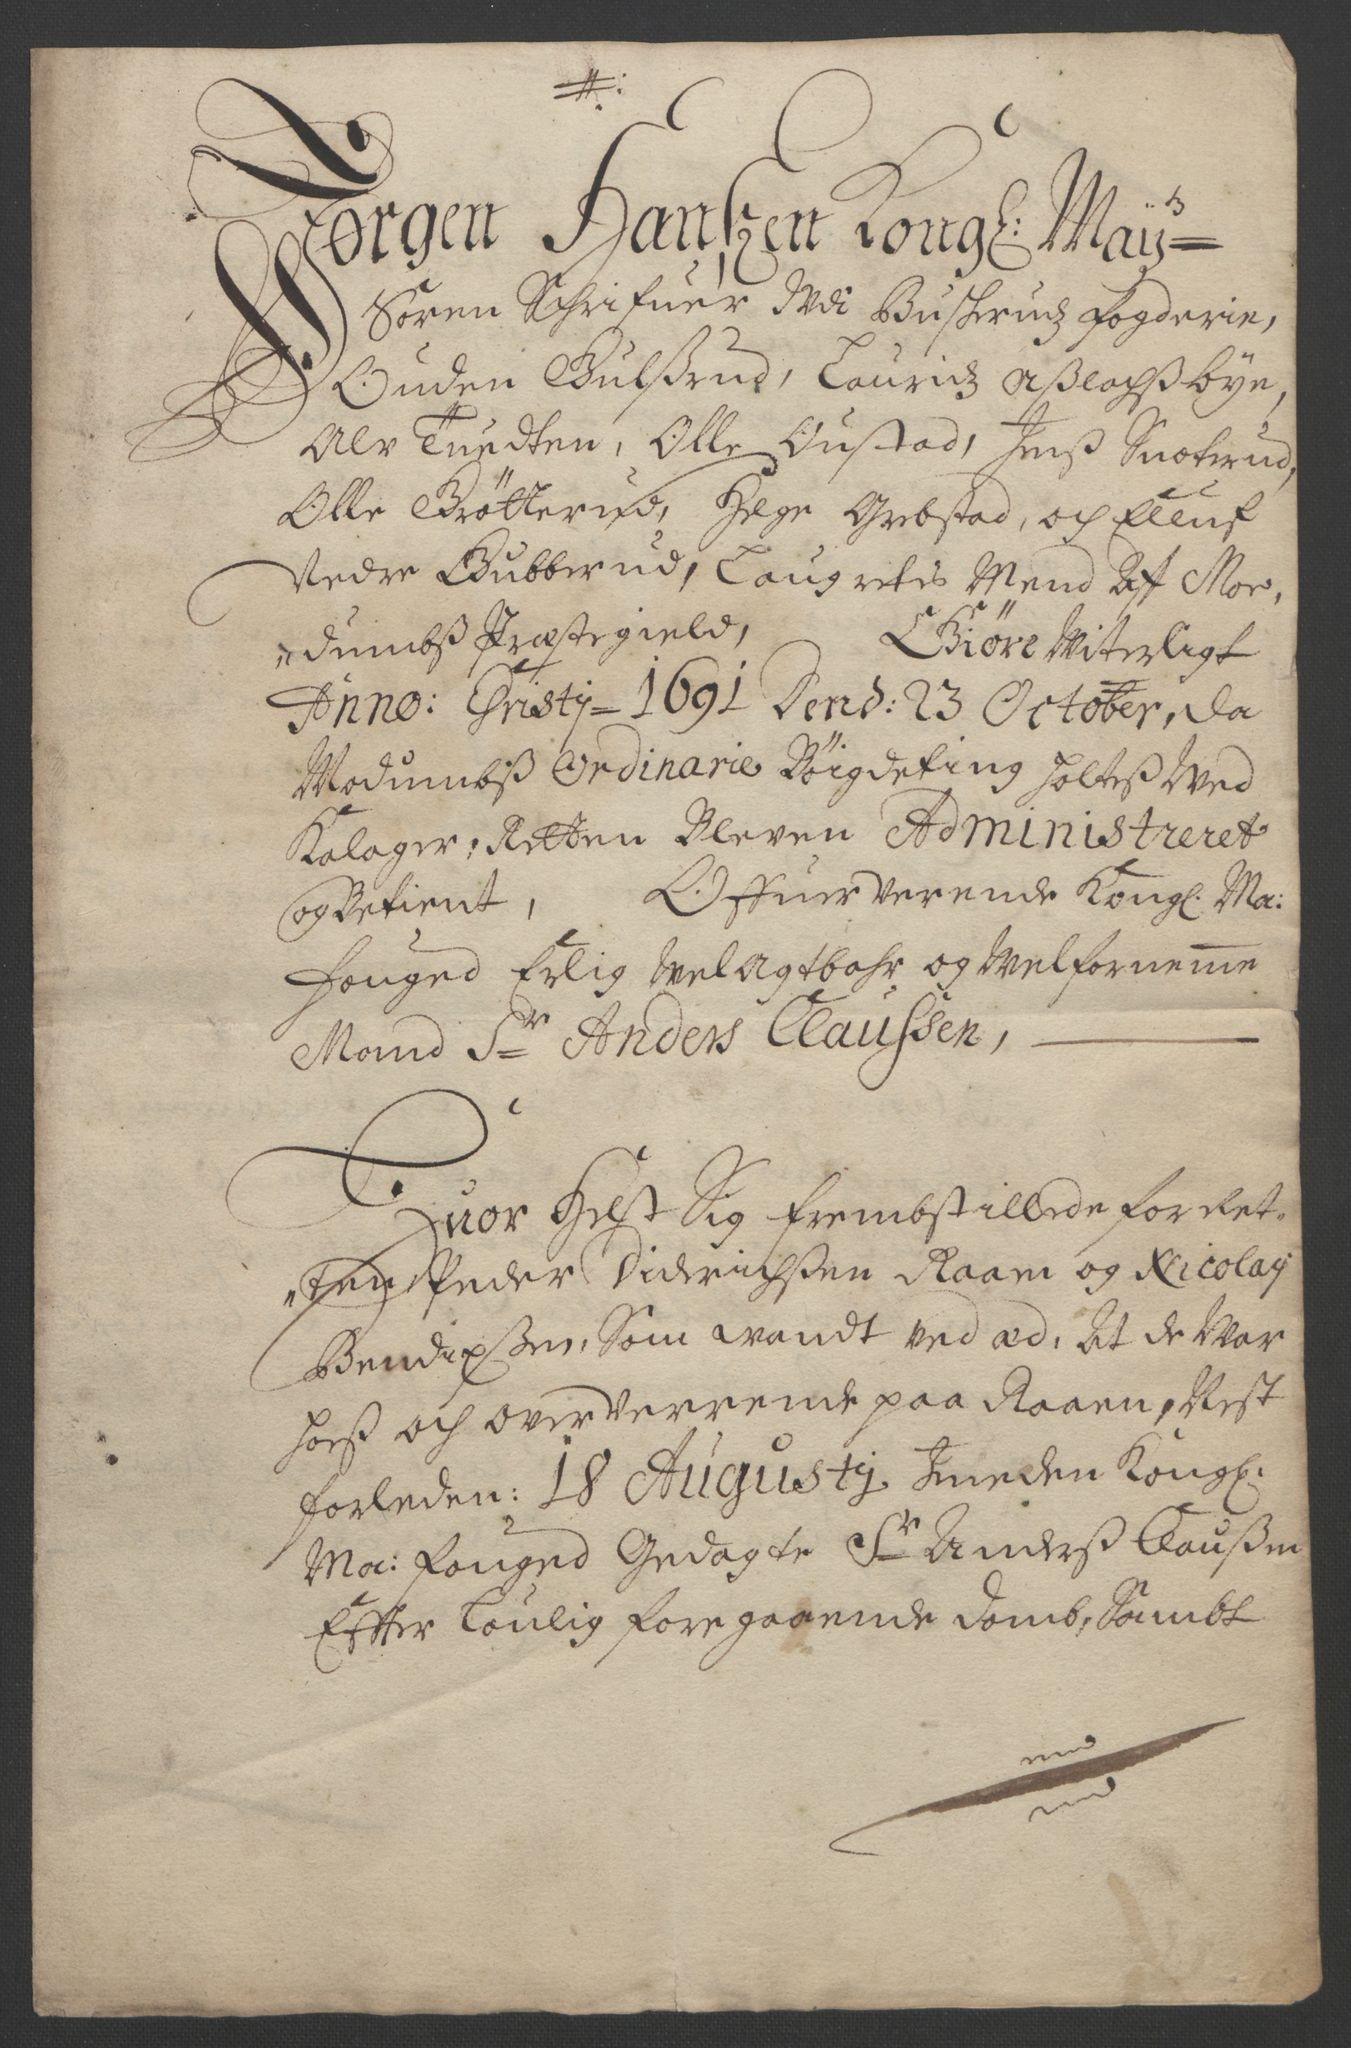 RA, Rentekammeret inntil 1814, Reviderte regnskaper, Fogderegnskap, R25/L1681: Fogderegnskap Buskerud, 1691-1692, s. 302